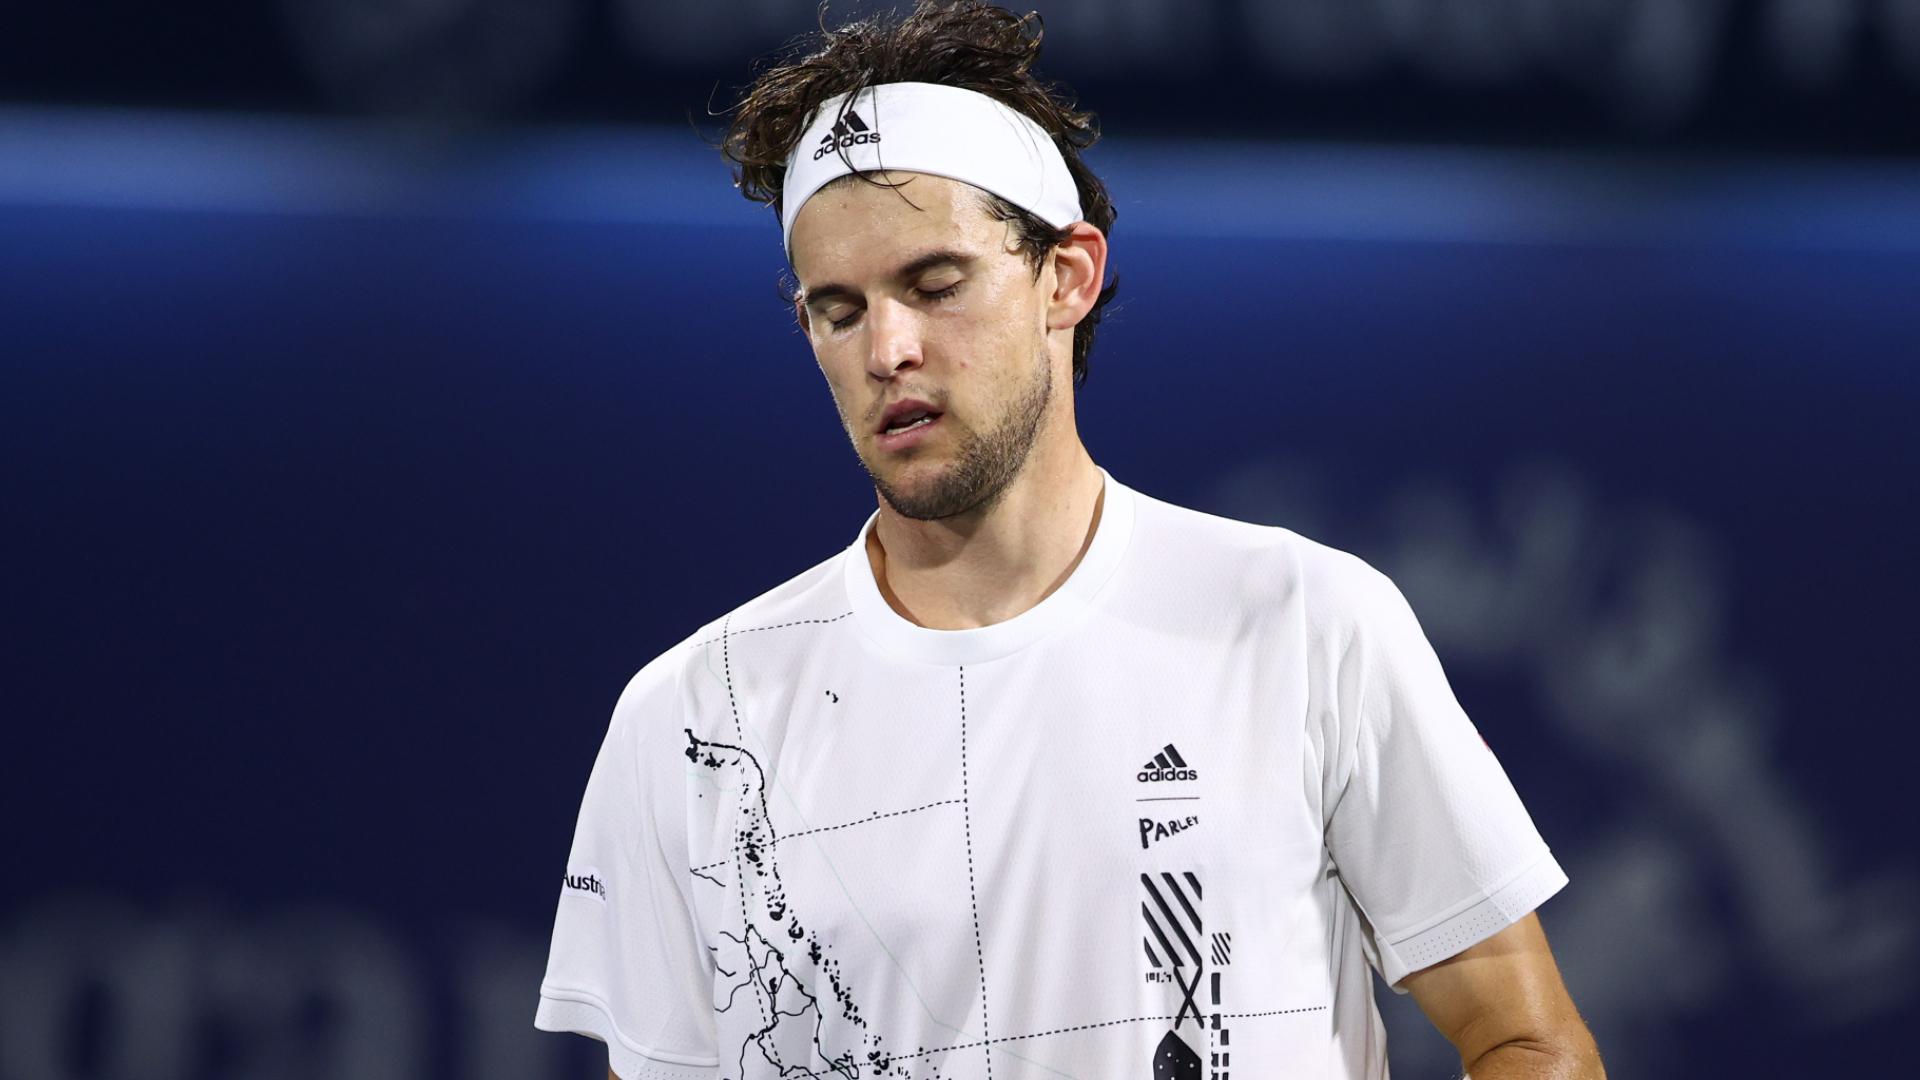 Thiem stunned by Harris in second round in Dubai